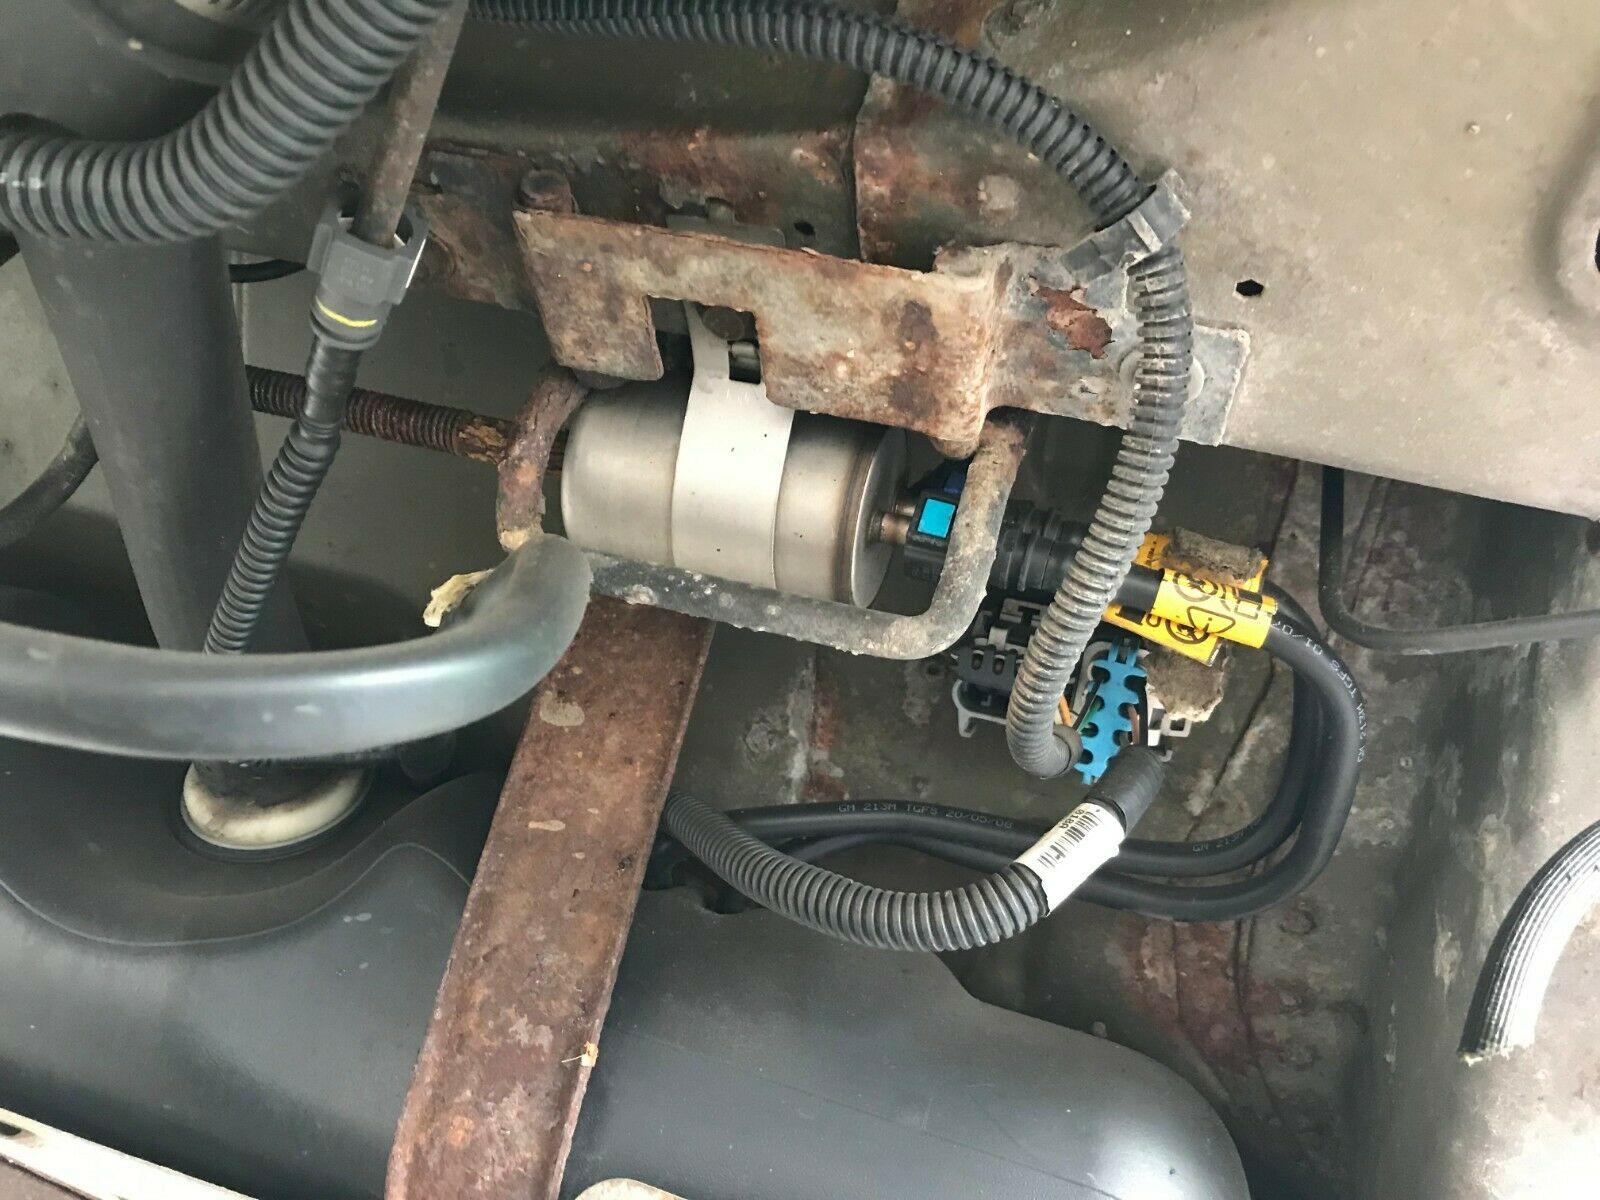 2003-10 Chevy Cobalt Saturn Ion Pontiac G5 Nyon Gas Fuel Vapor Line Repair  Kit   eBayeBay